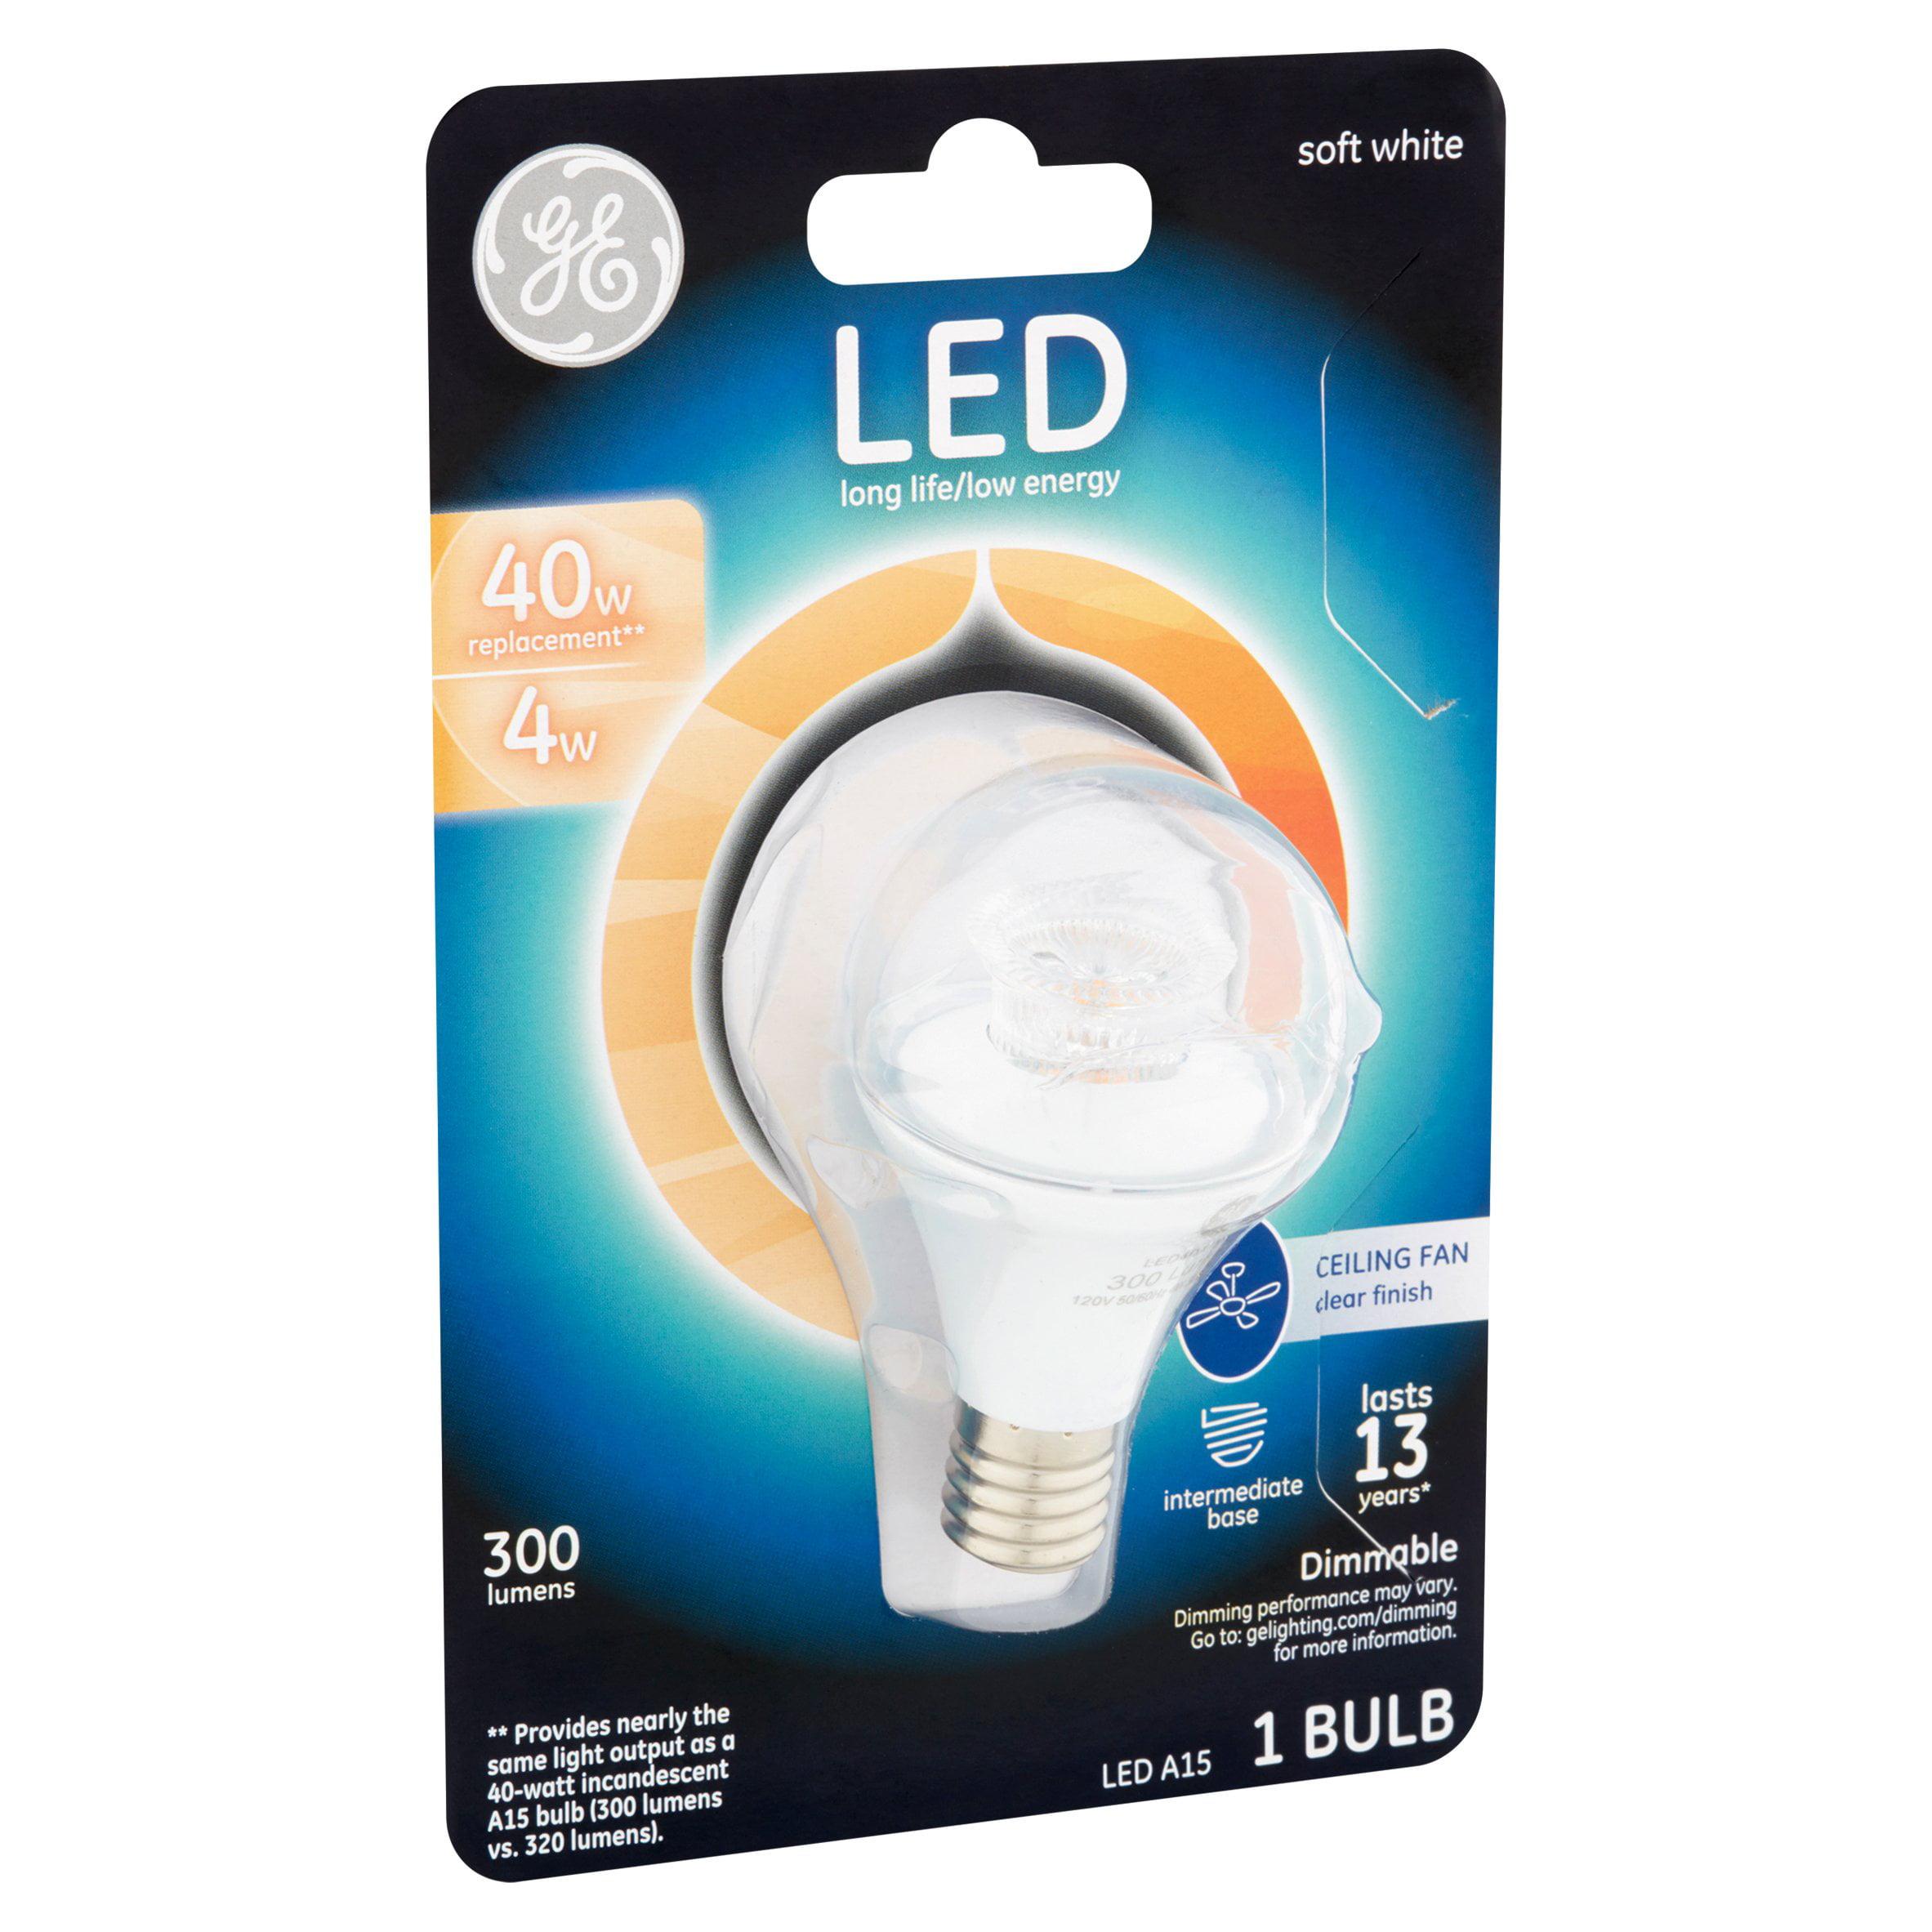 GE LED 4W 300 Lumens A15 Soft White Bulb Walmart